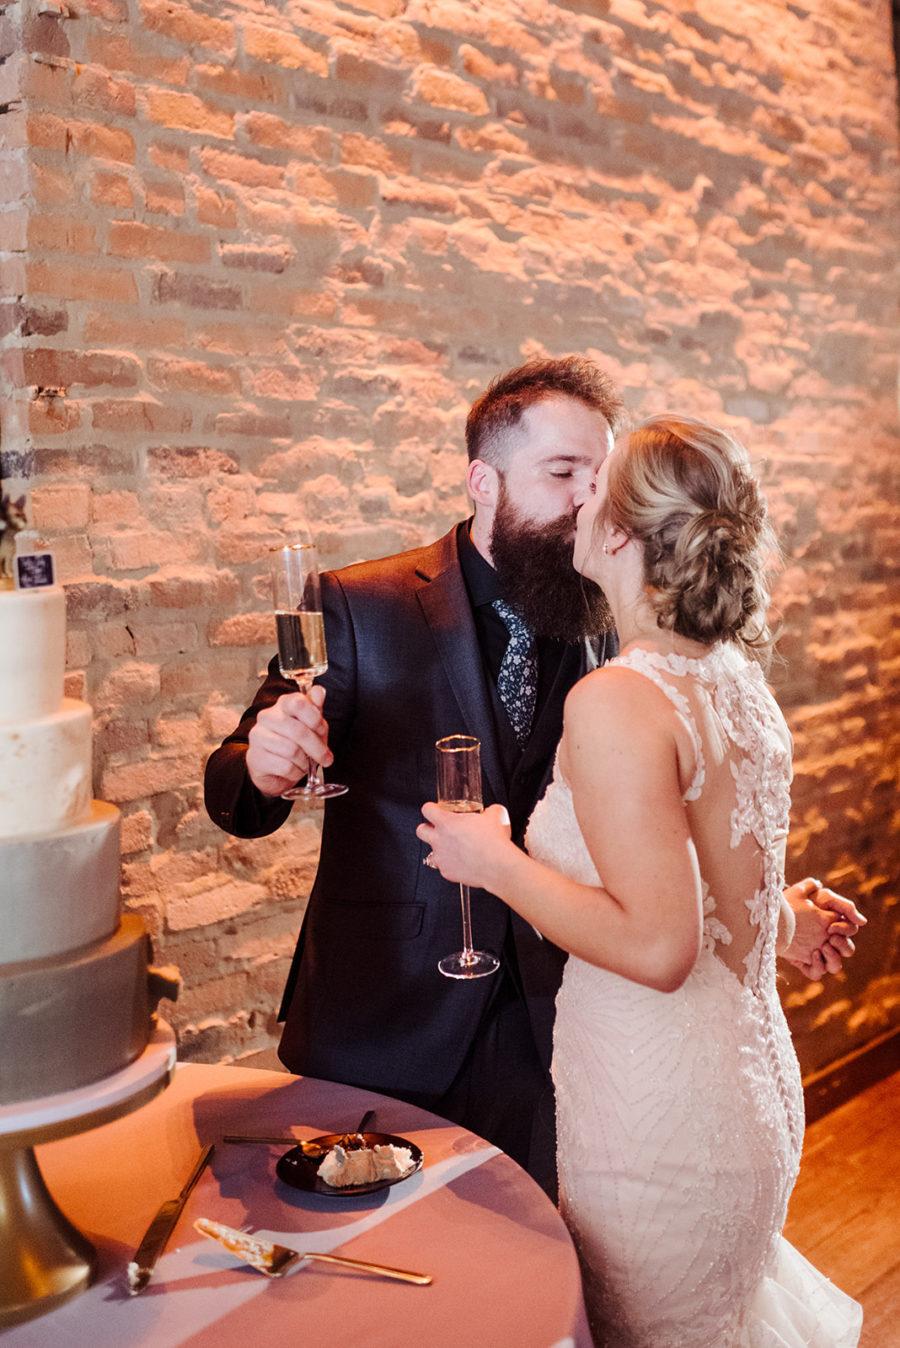 Wedding cake cutting: Nashville wedding at Clementine featured on Nashville Bride Guide